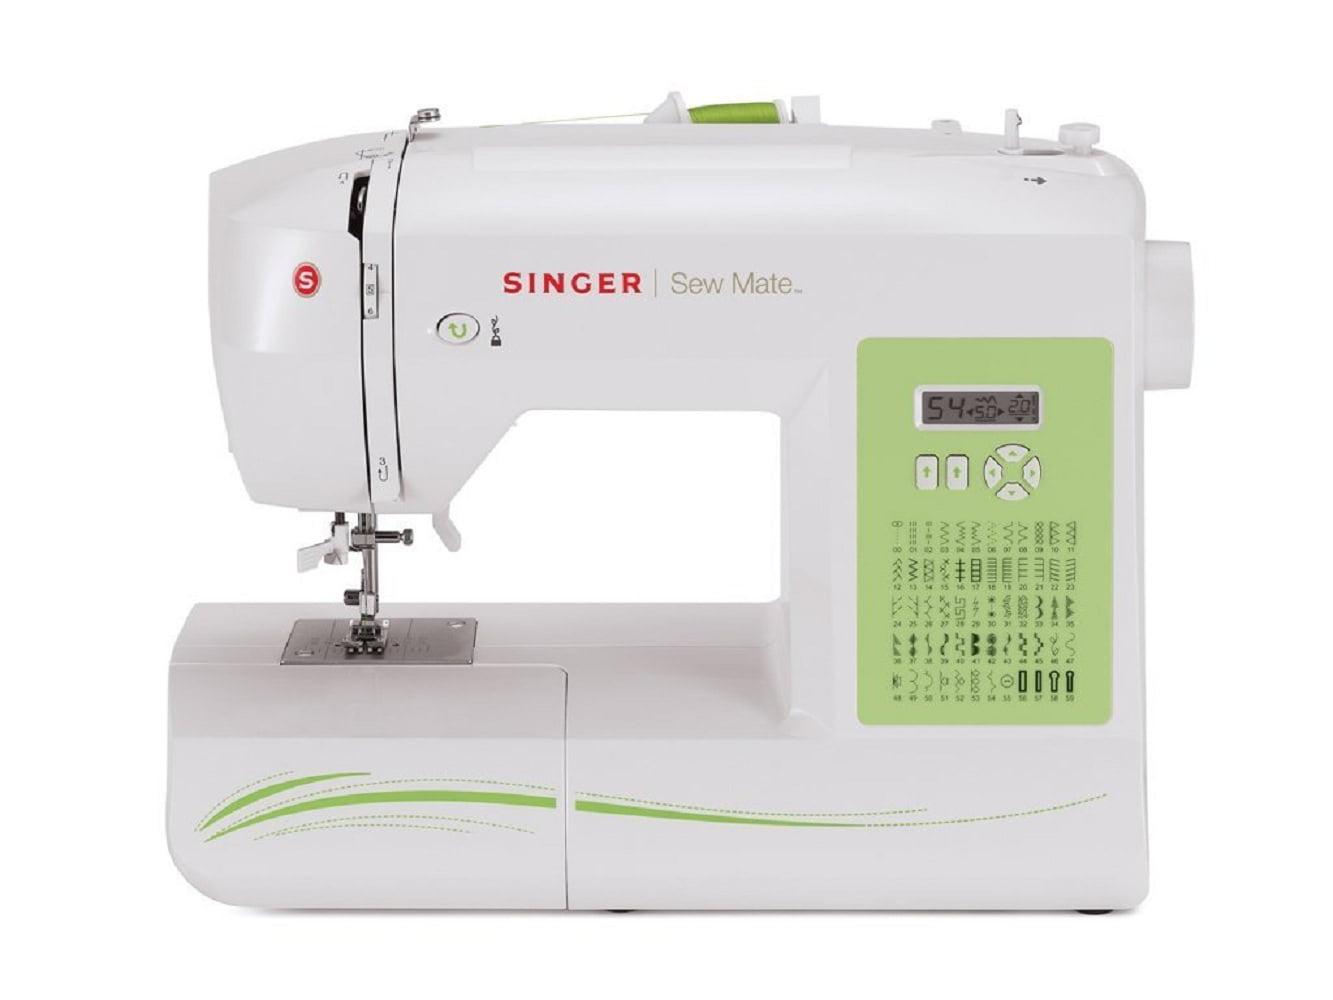 Singer 5400 Sew Mate 60-Stitch Sewing Machine - Walmart